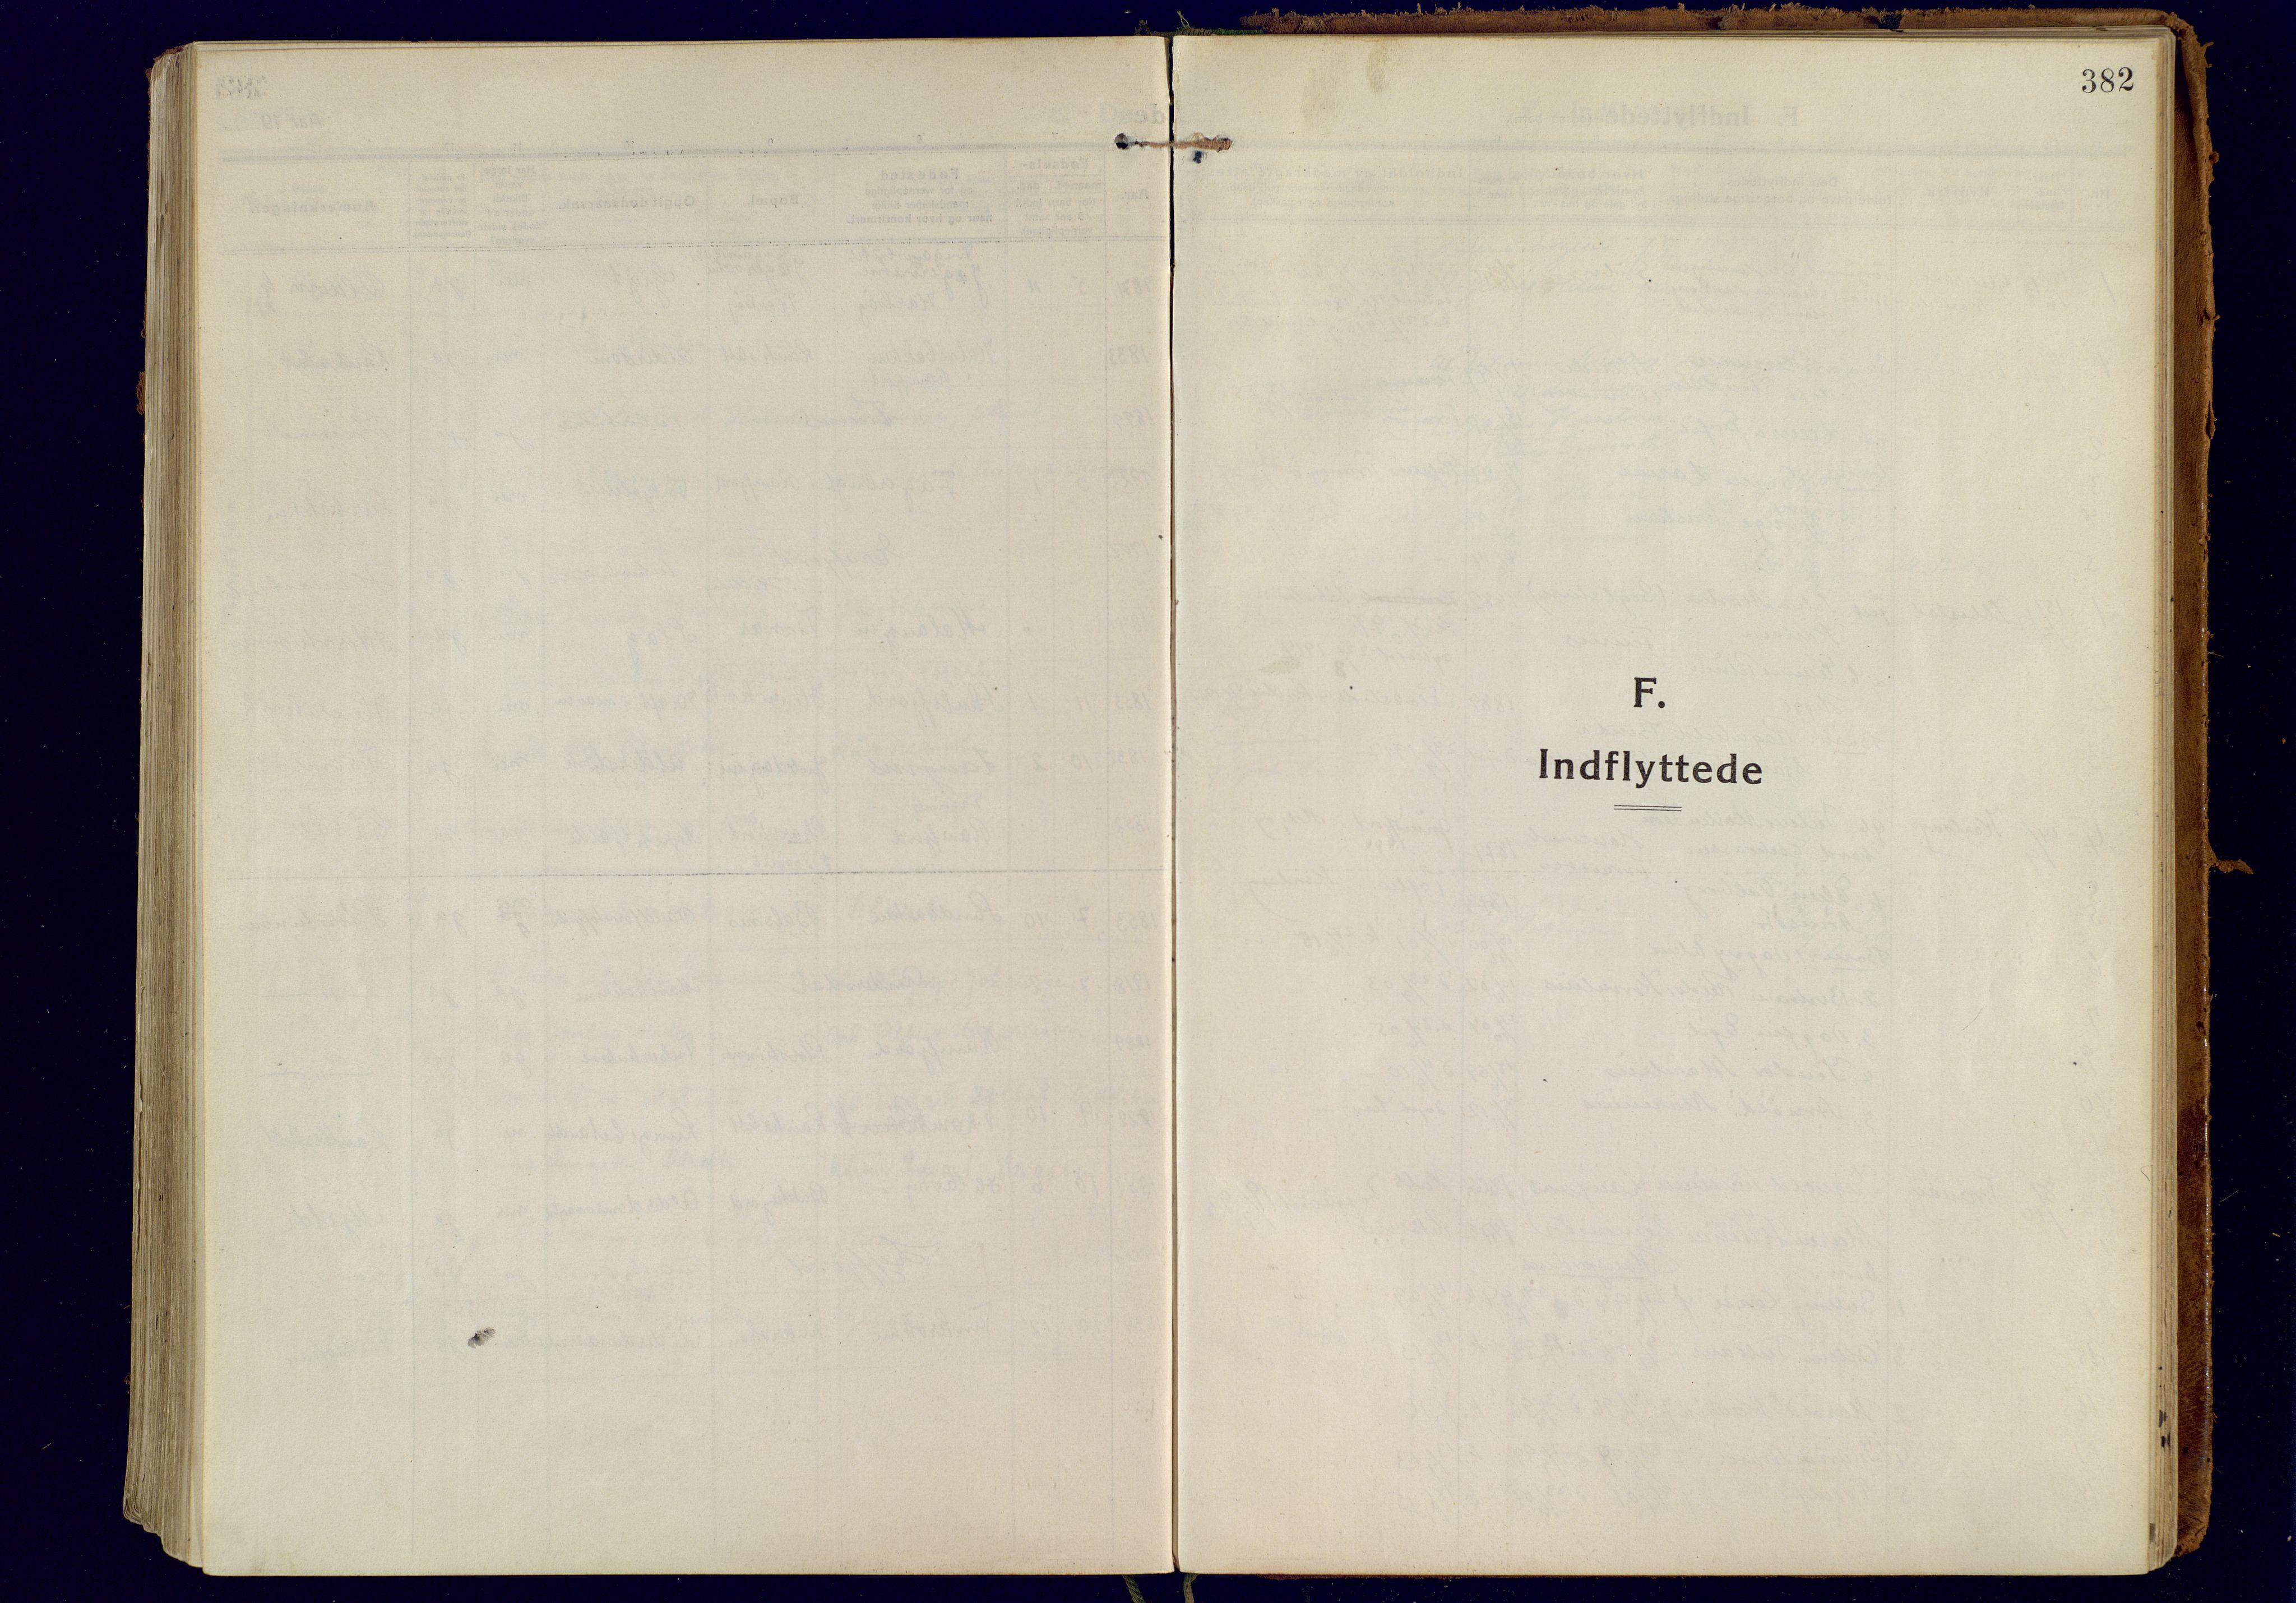 SATØ, Tromsøysund sokneprestkontor, G/Ga: Ministerialbok nr. 8, 1914-1922, s. 382